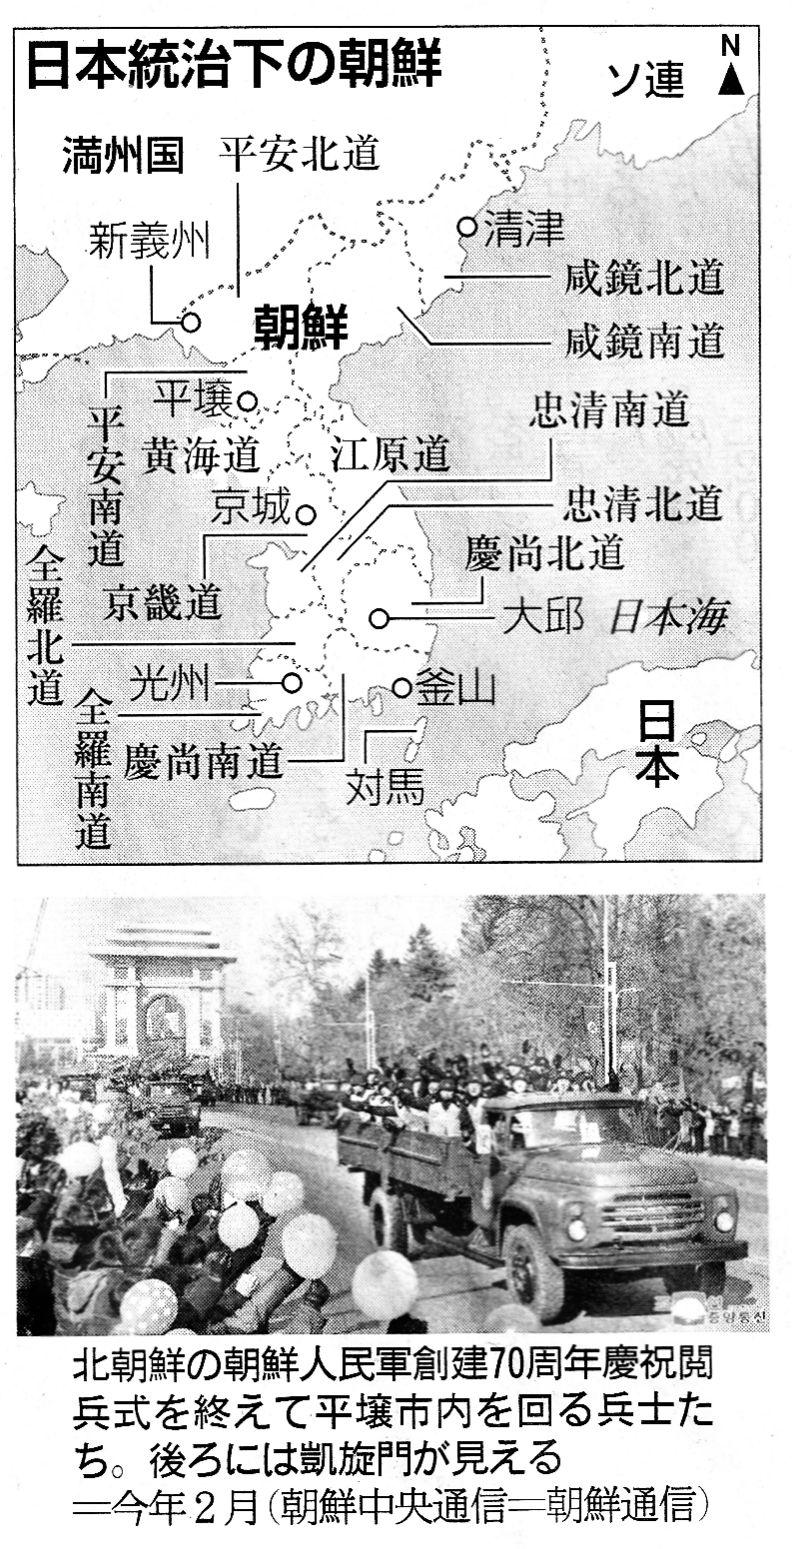 70周年記念日と民衆